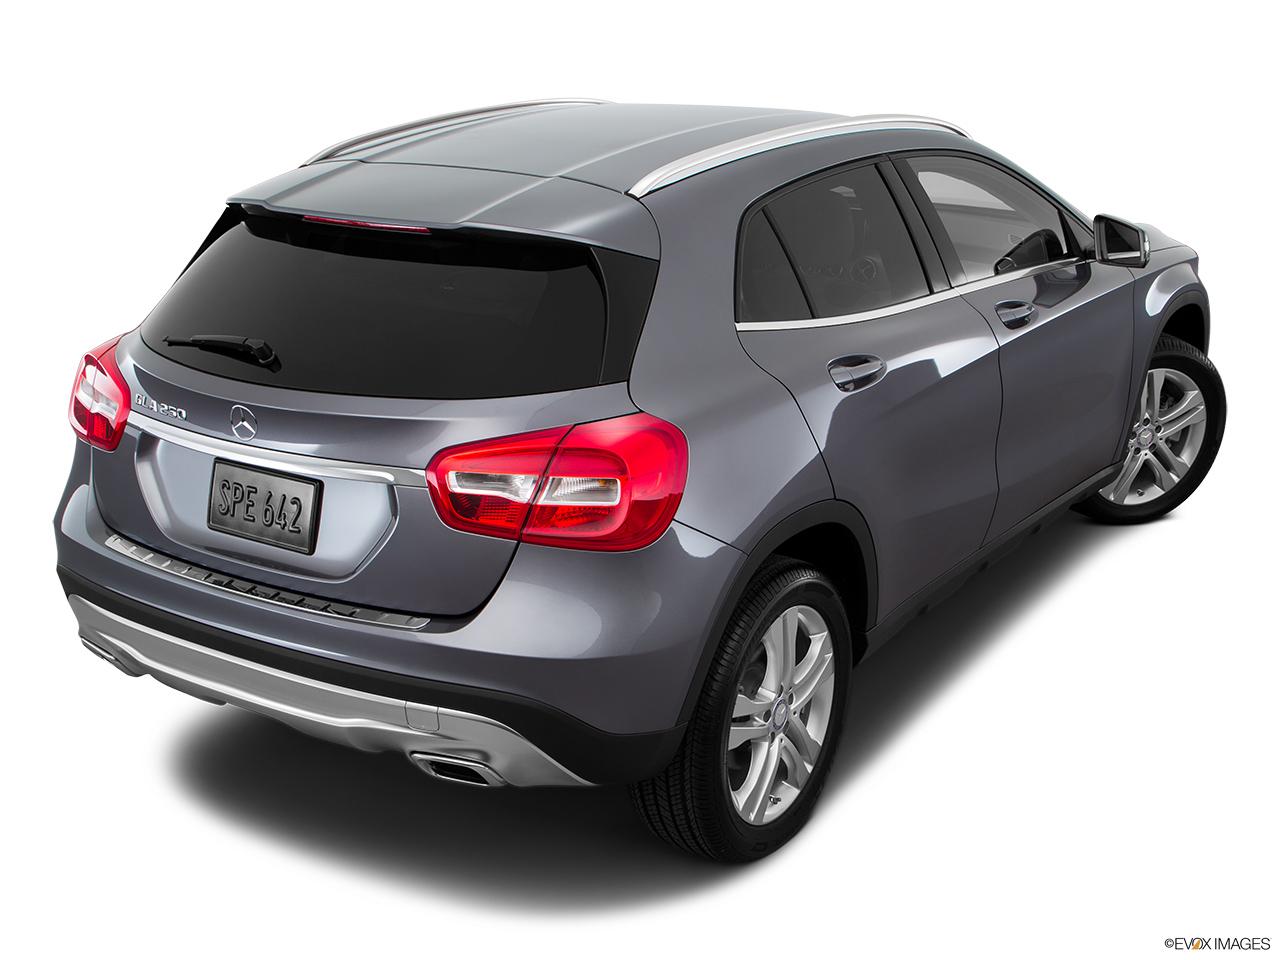 Car pictures list for mercedes benz gla 2016 250 qatar for Mercedes benz payment estimator